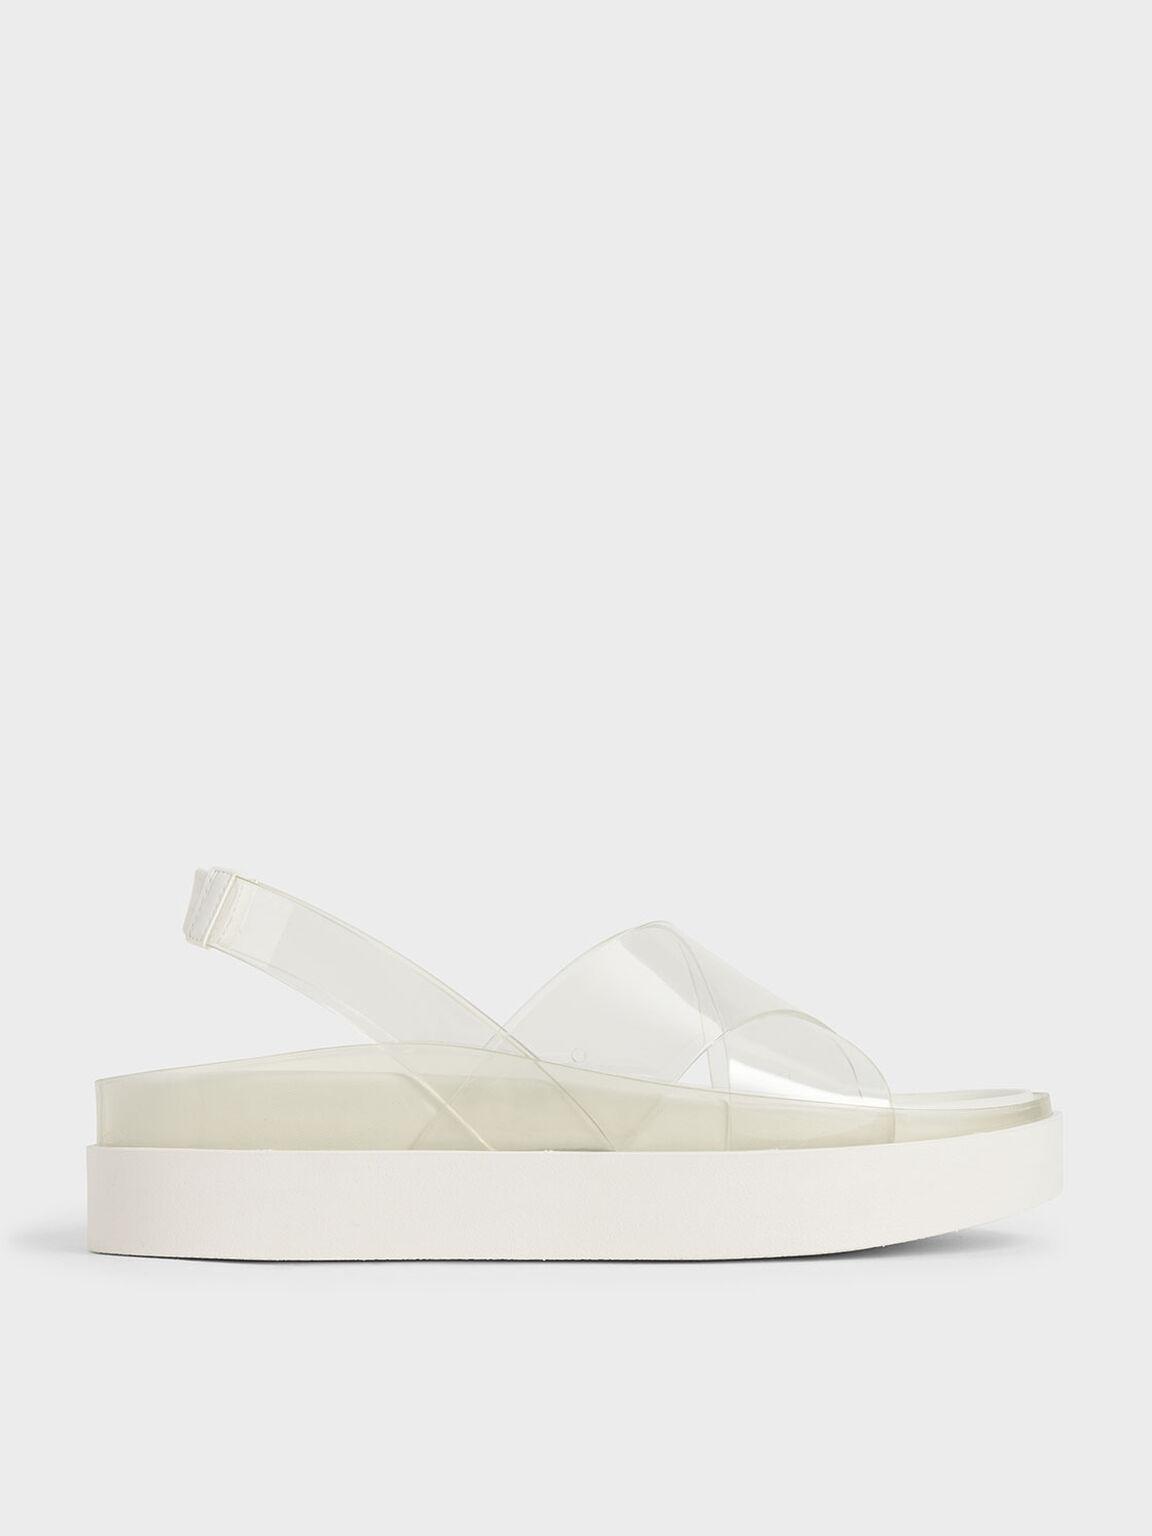 See-Through Effect Flatform Sandals, White, hi-res